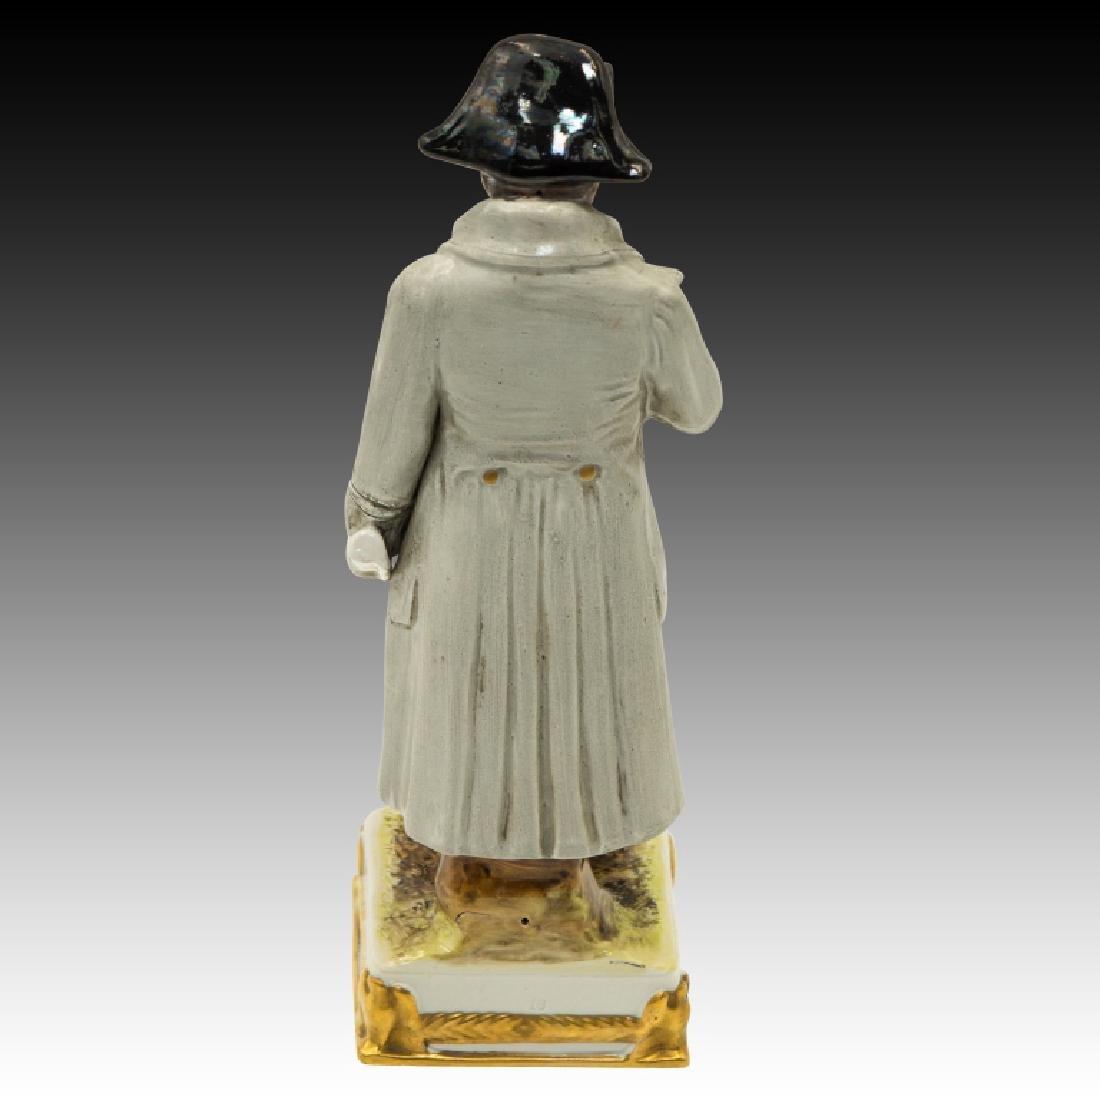 2 Figurines Napoleon and Ticouette - 8